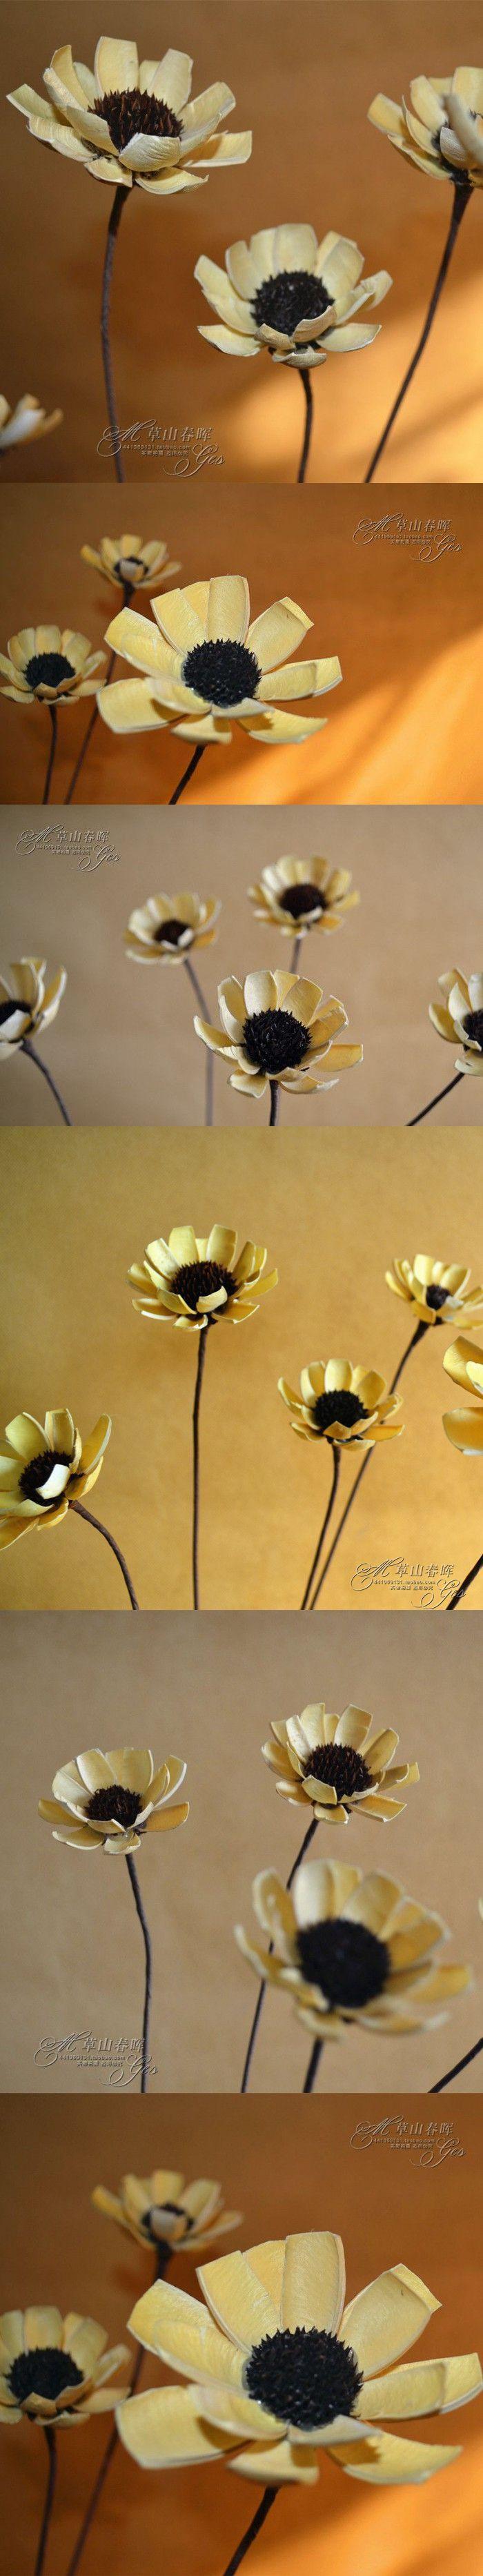 Dried chrysanthemum rustic wood dining table DIY European country home window display wholesale floral art plant $9.9